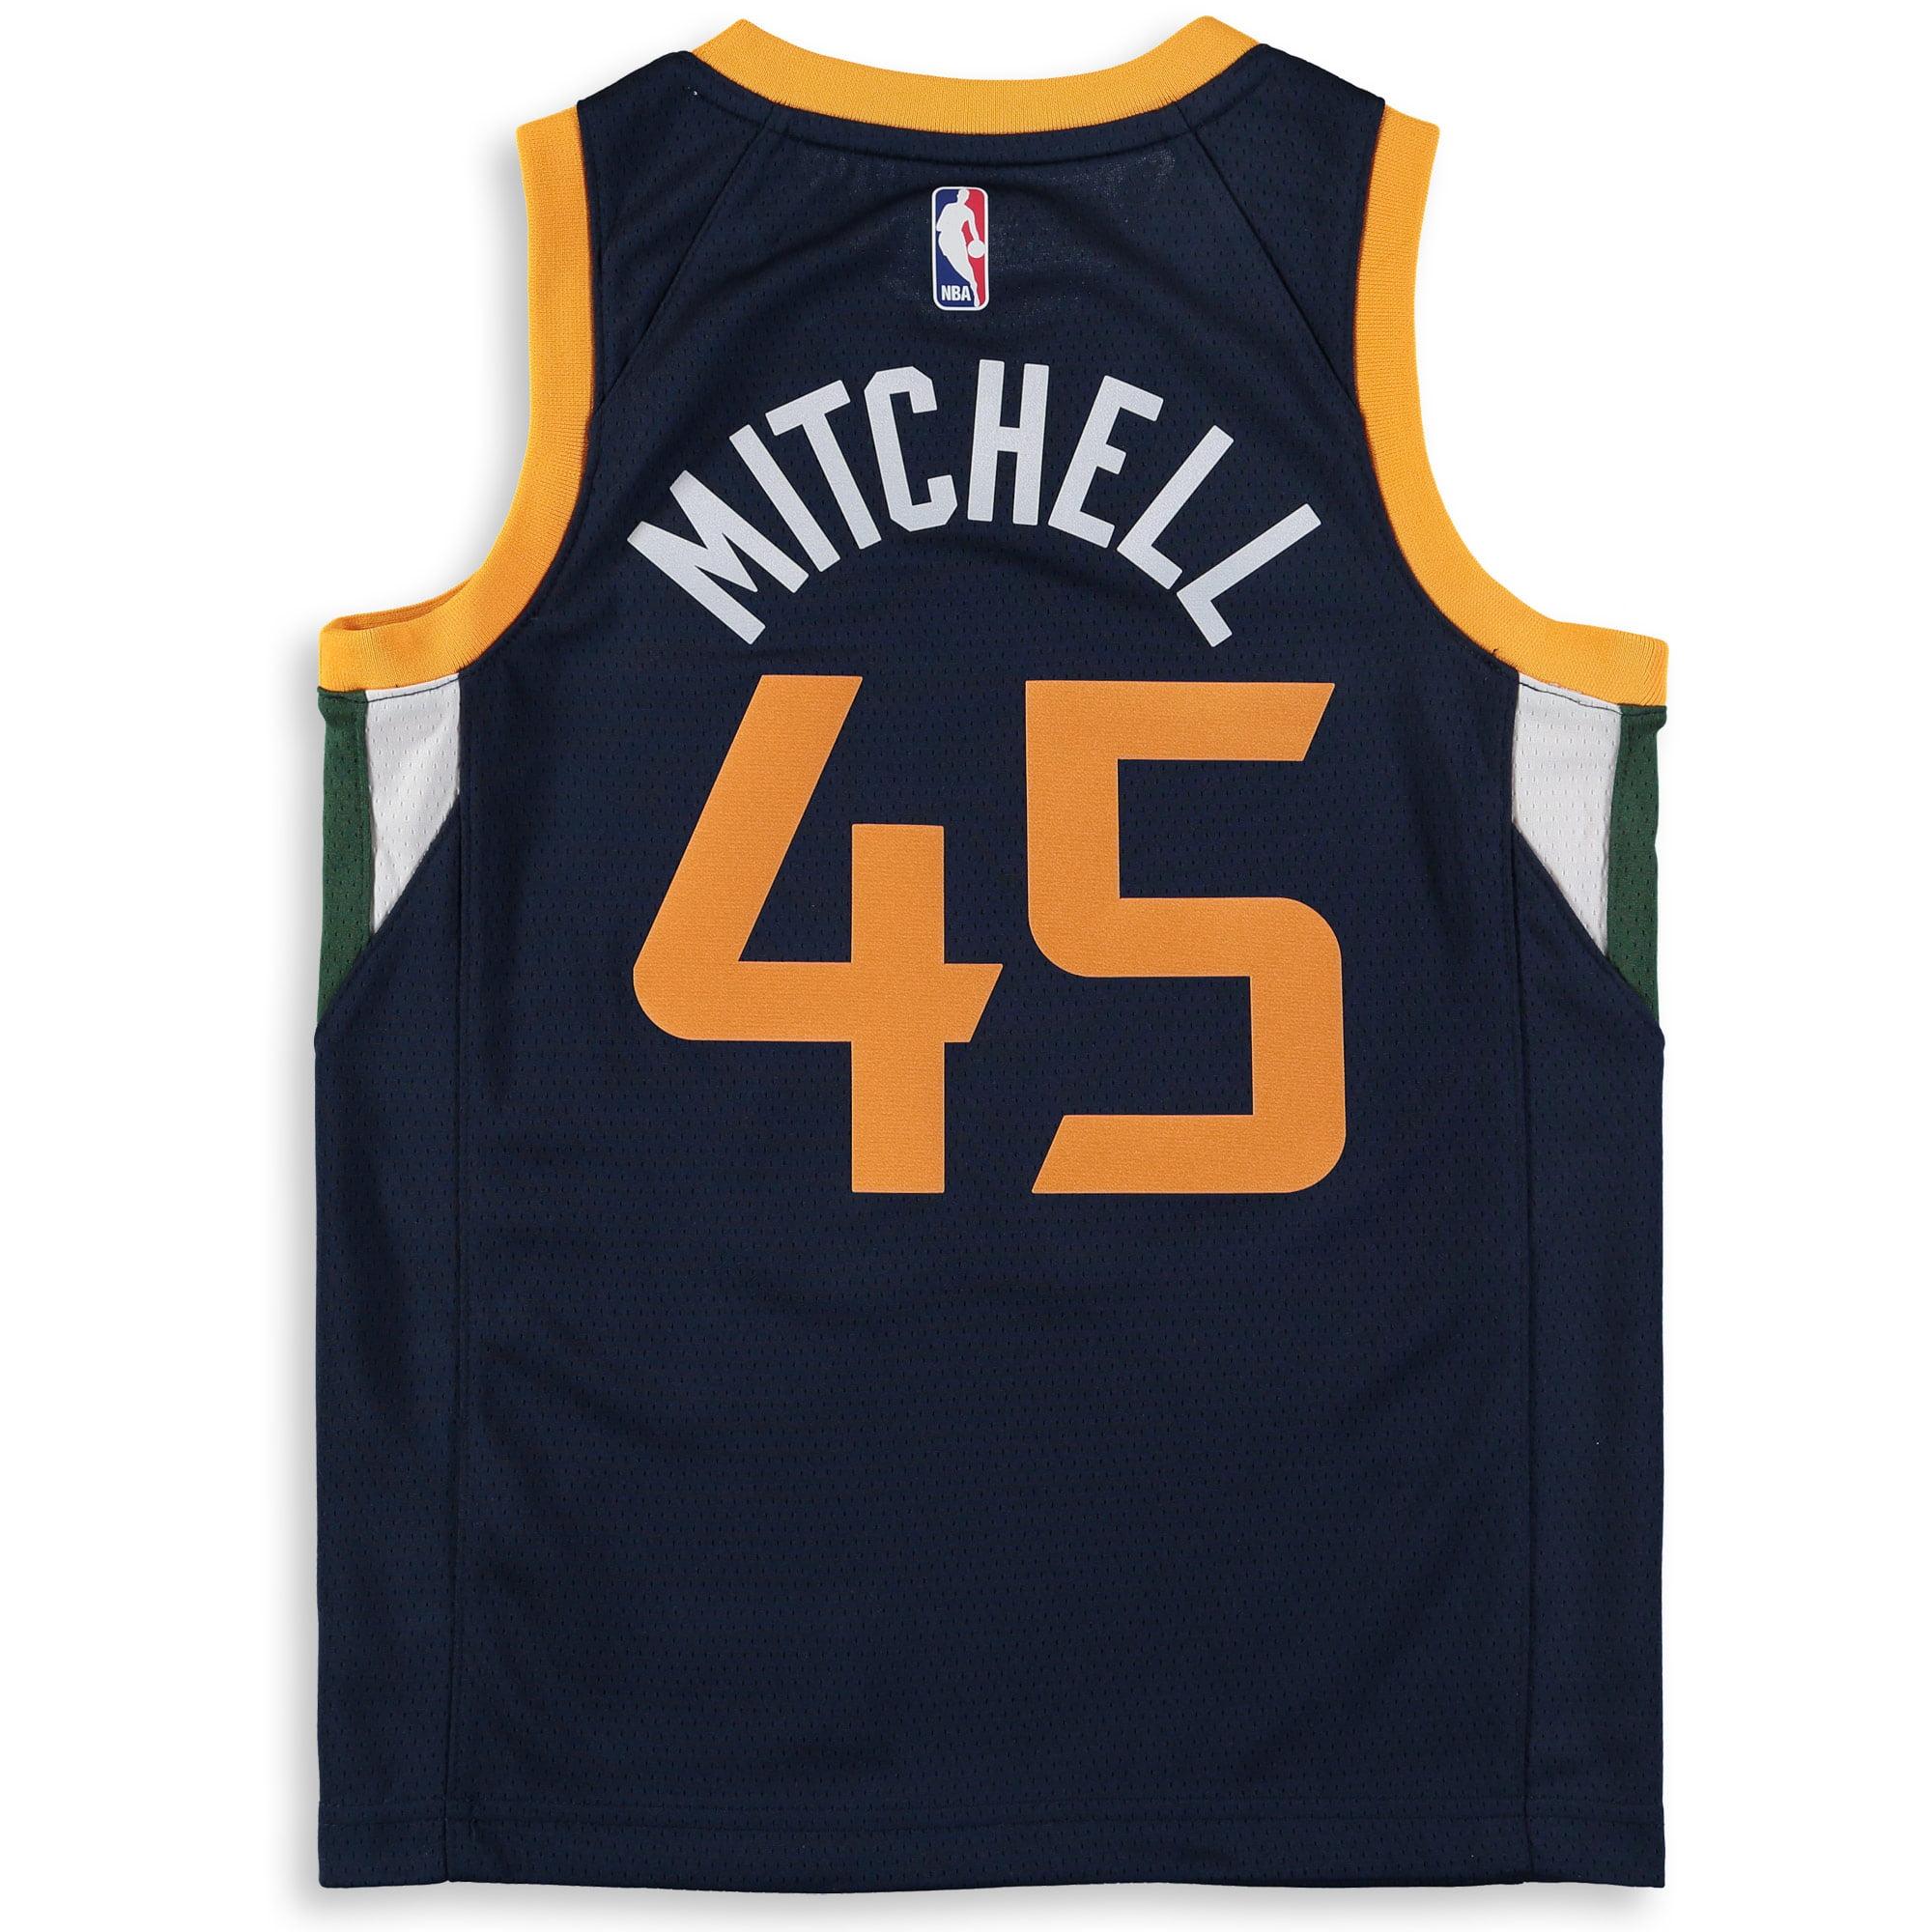 reputable site 077bd 07a8a Donovan Mitchell Utah Jazz Nike Youth Swingman Jersey - Navy